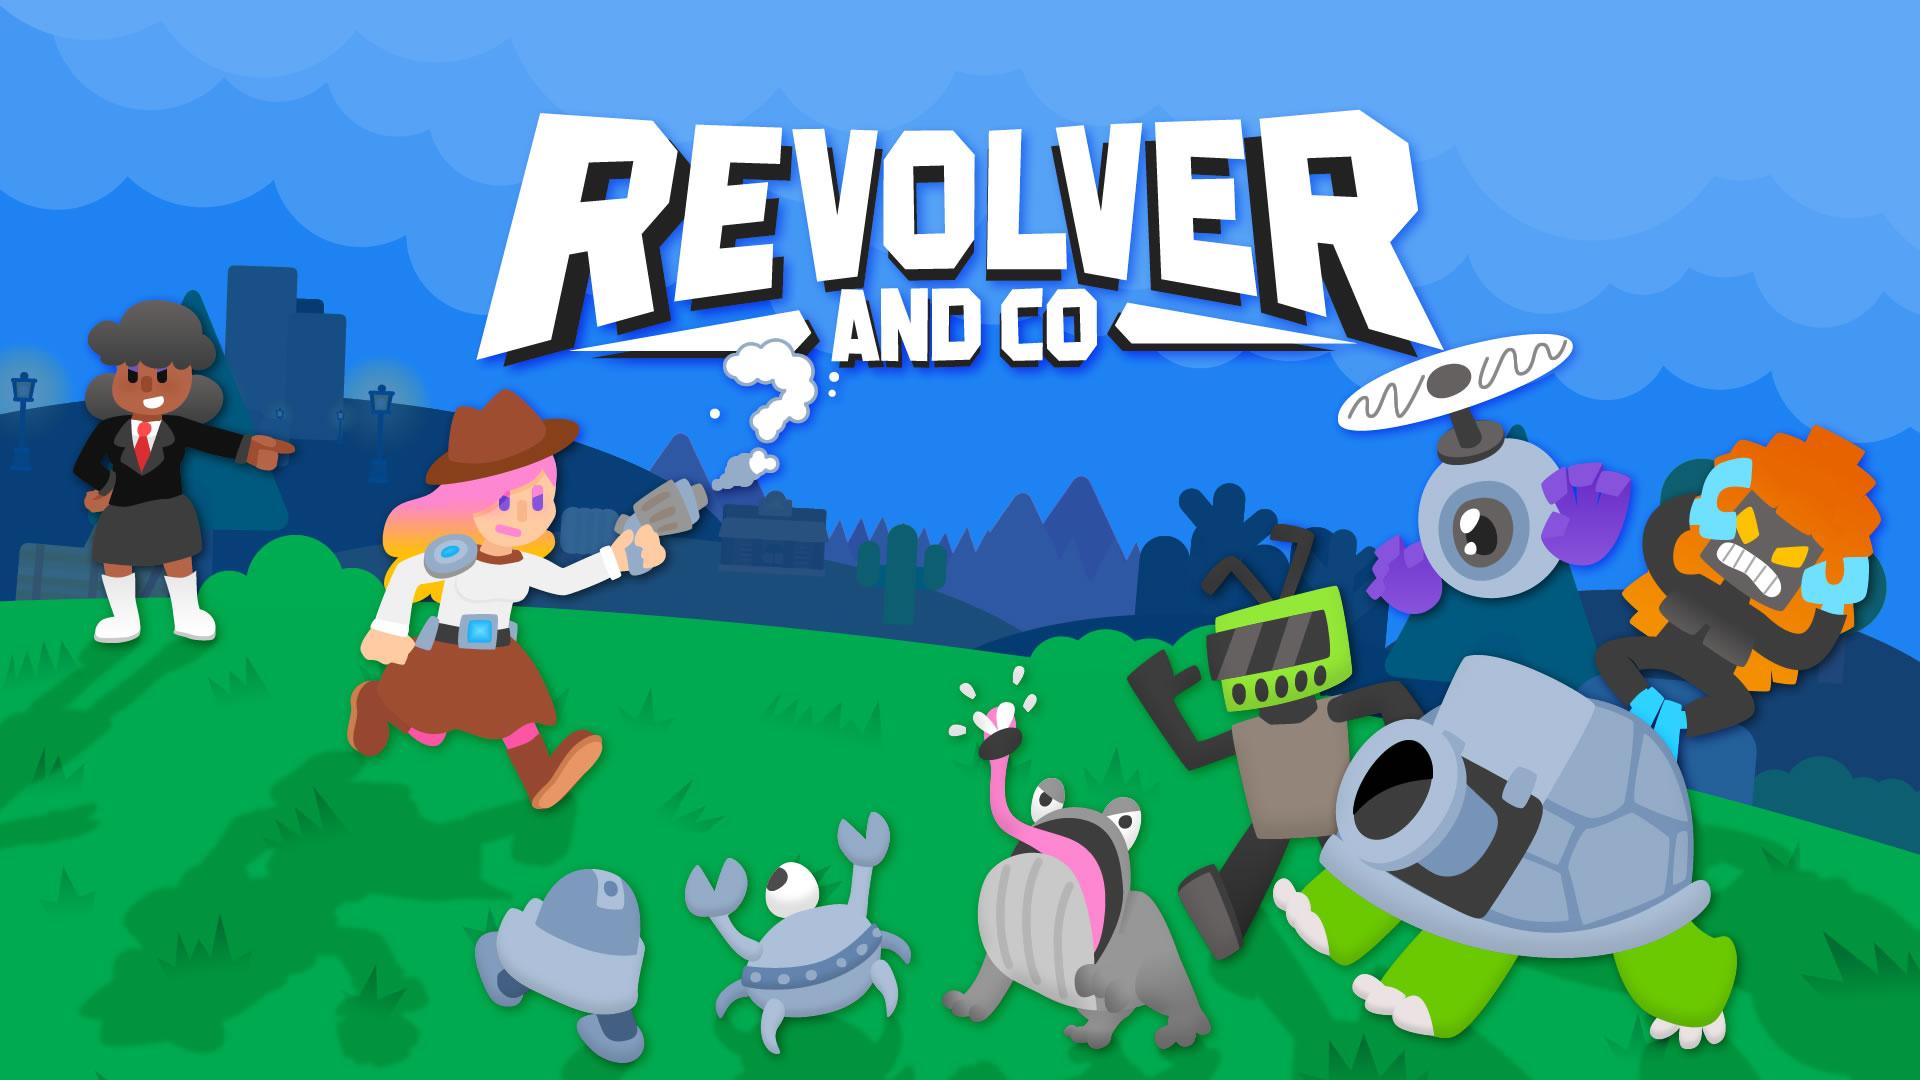 Revolver and Co